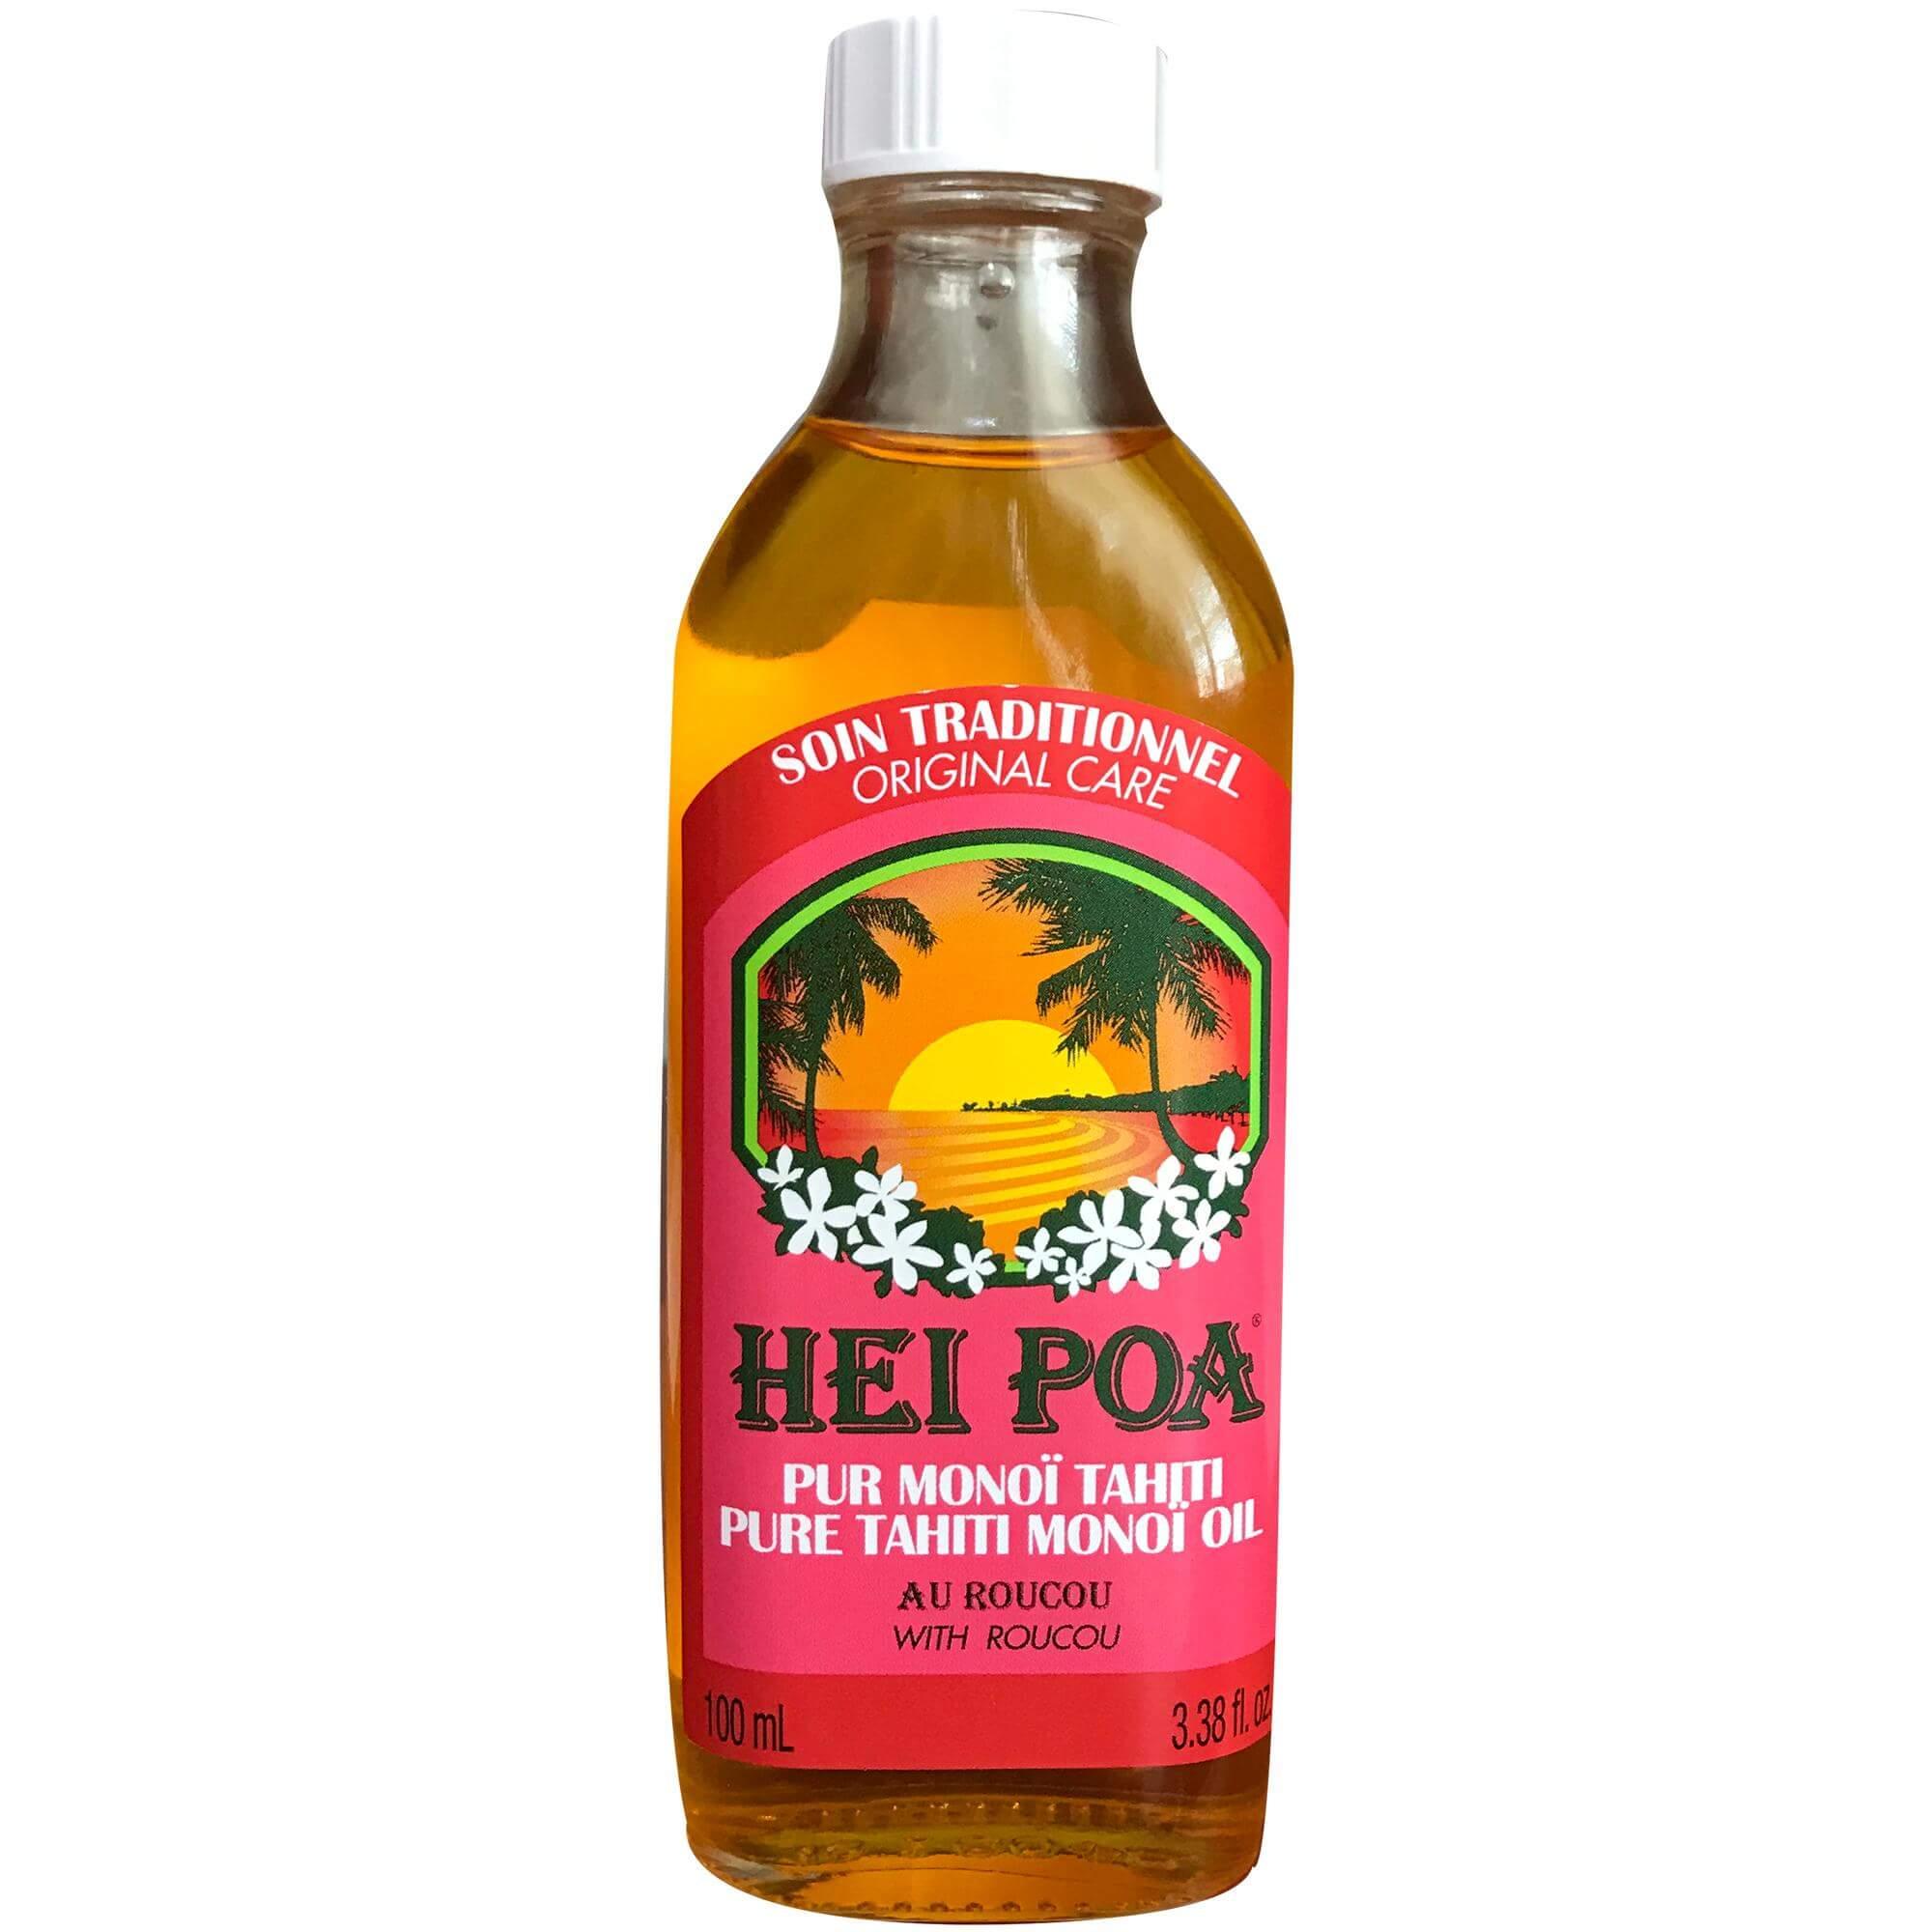 Hei Poa Pure Tahiti Monoi Oil Roucou Προσδίδει Μια Διακριτική, Χάλκινη Απόχρωση 100ml